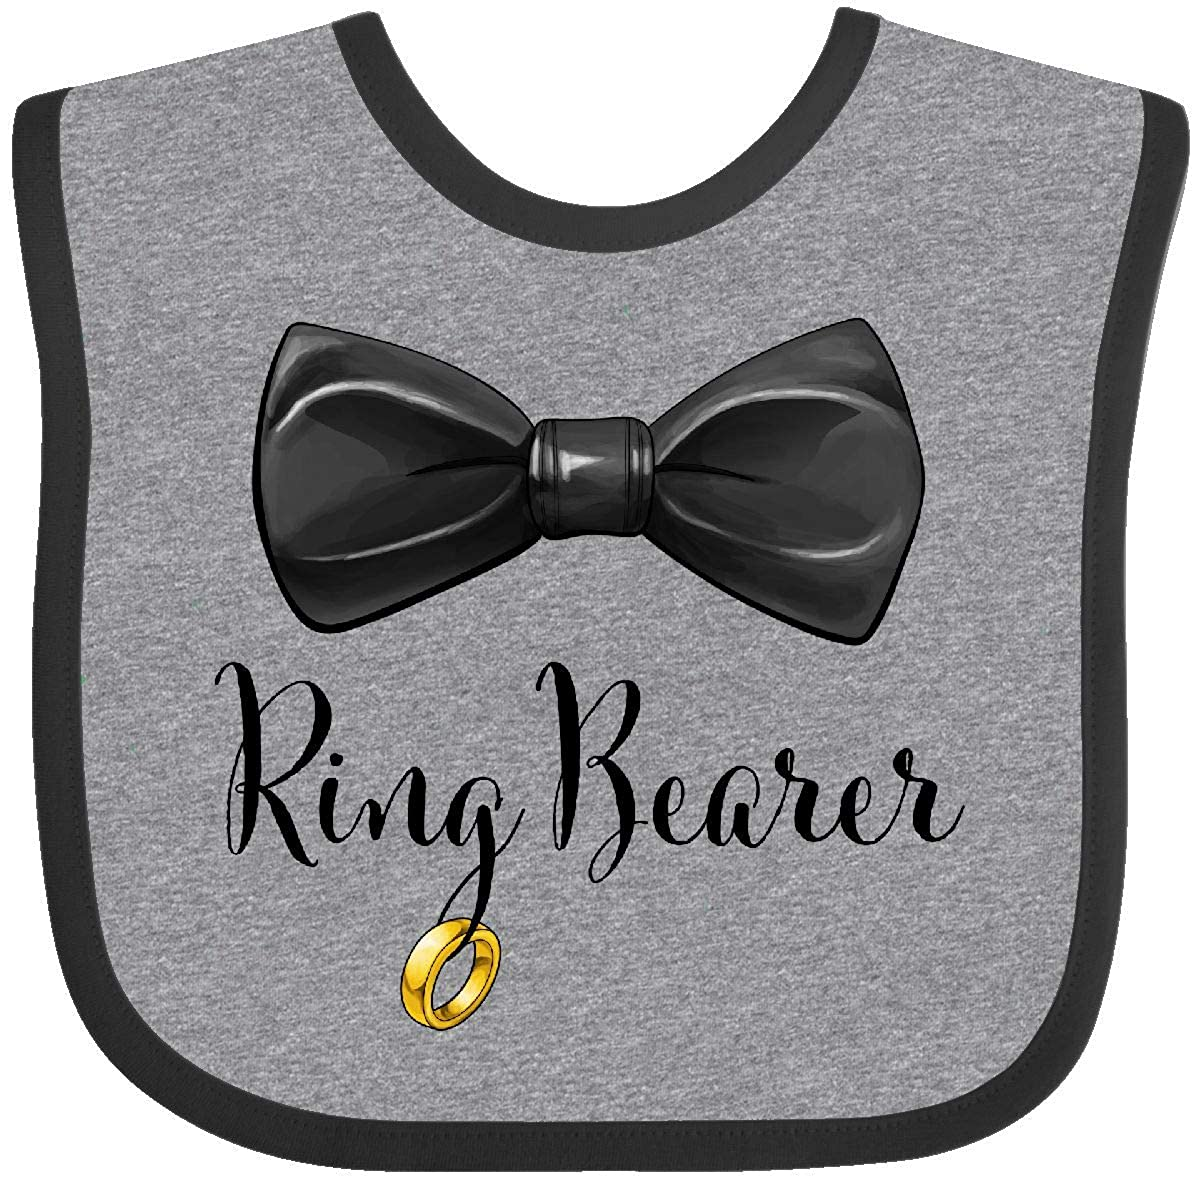 Inktastic - Ring Bearer- black bow tie Baby Bib 2ff56 14-196438-116-887-2987